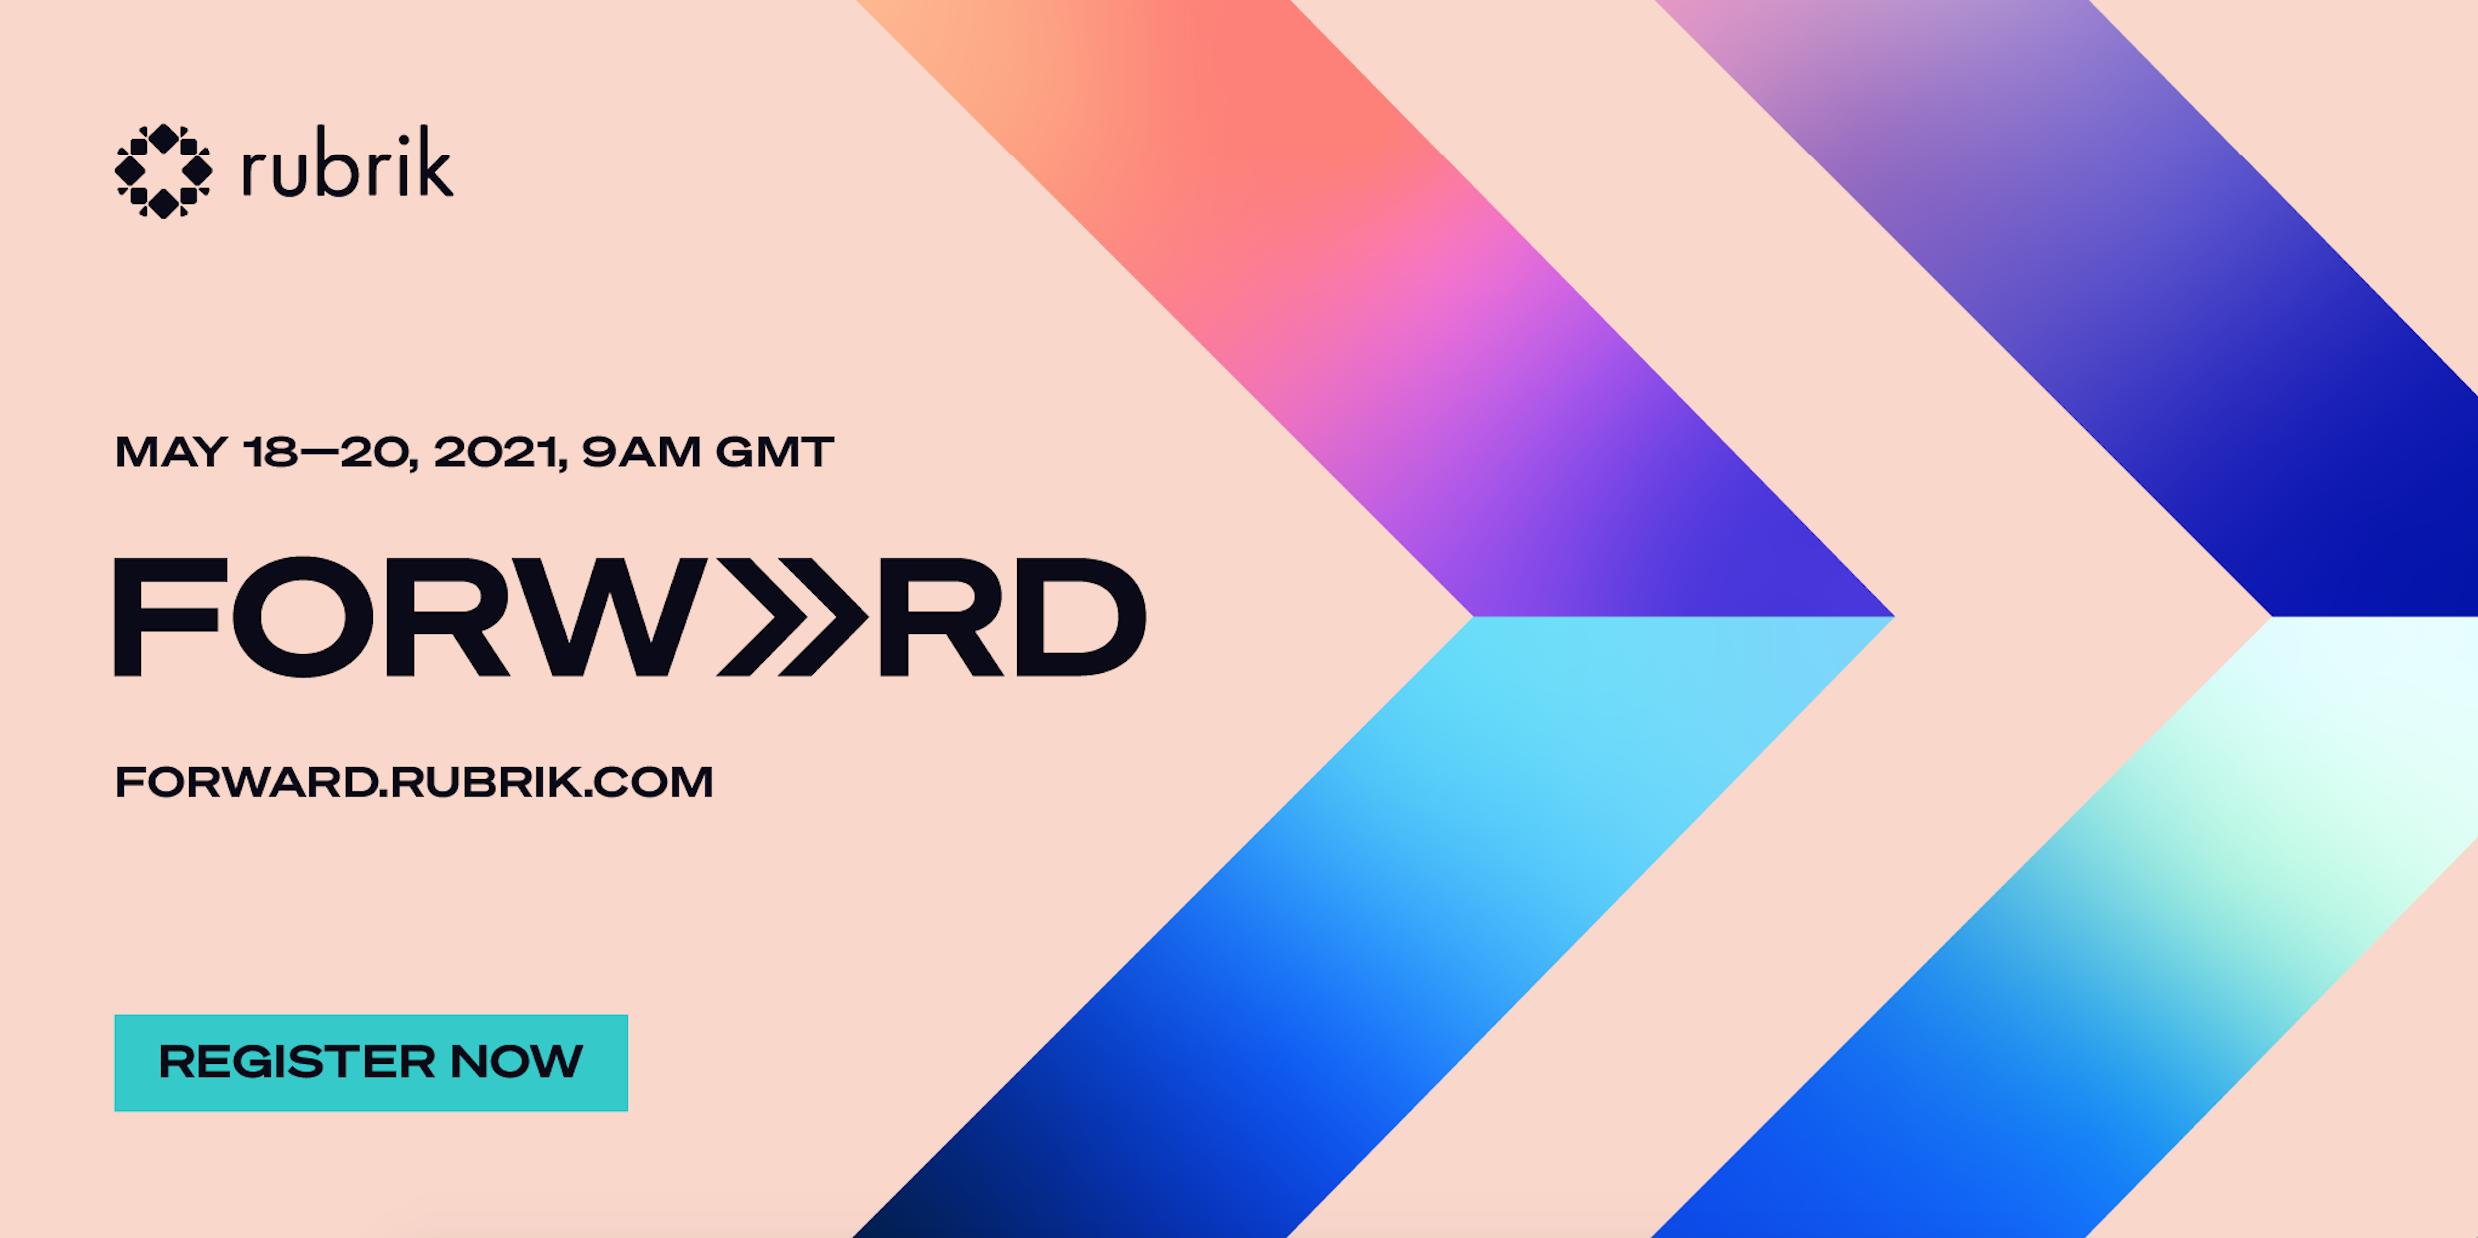 FORWARD: Register Now for Rubrik's Digital Summit